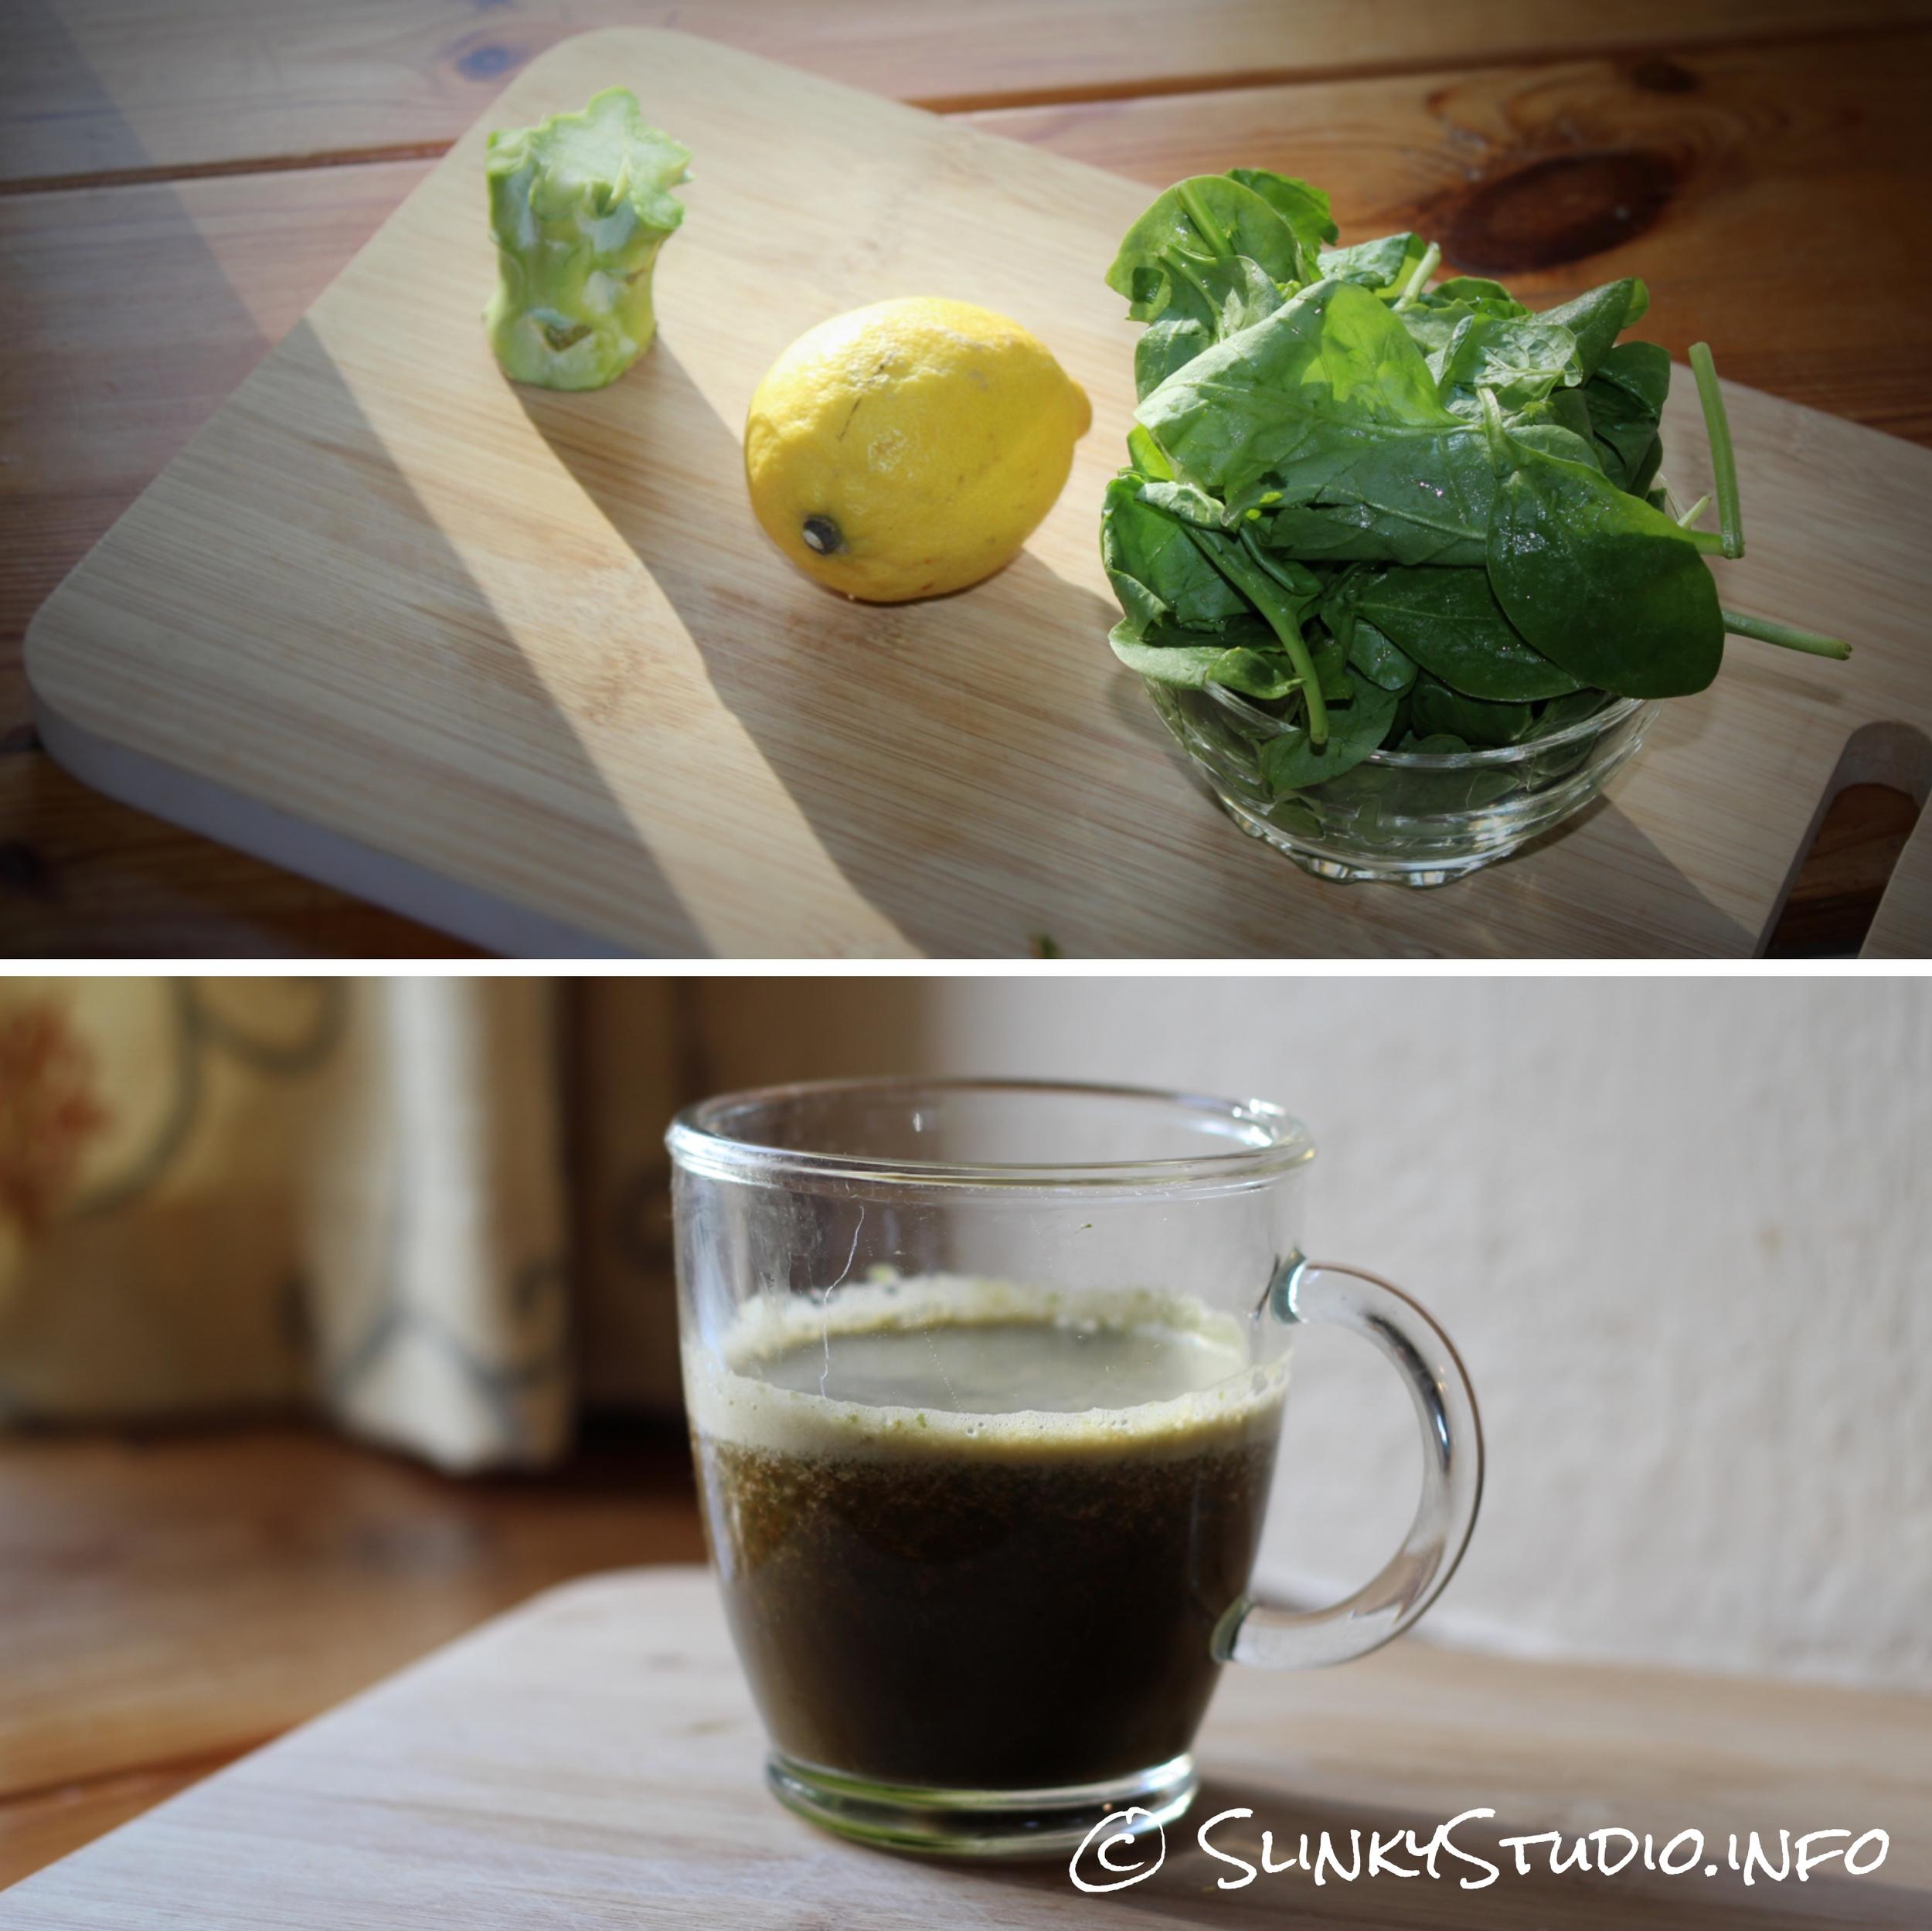 Novis Vita Juicer Spinach Broccoli Stem Lemon Juice